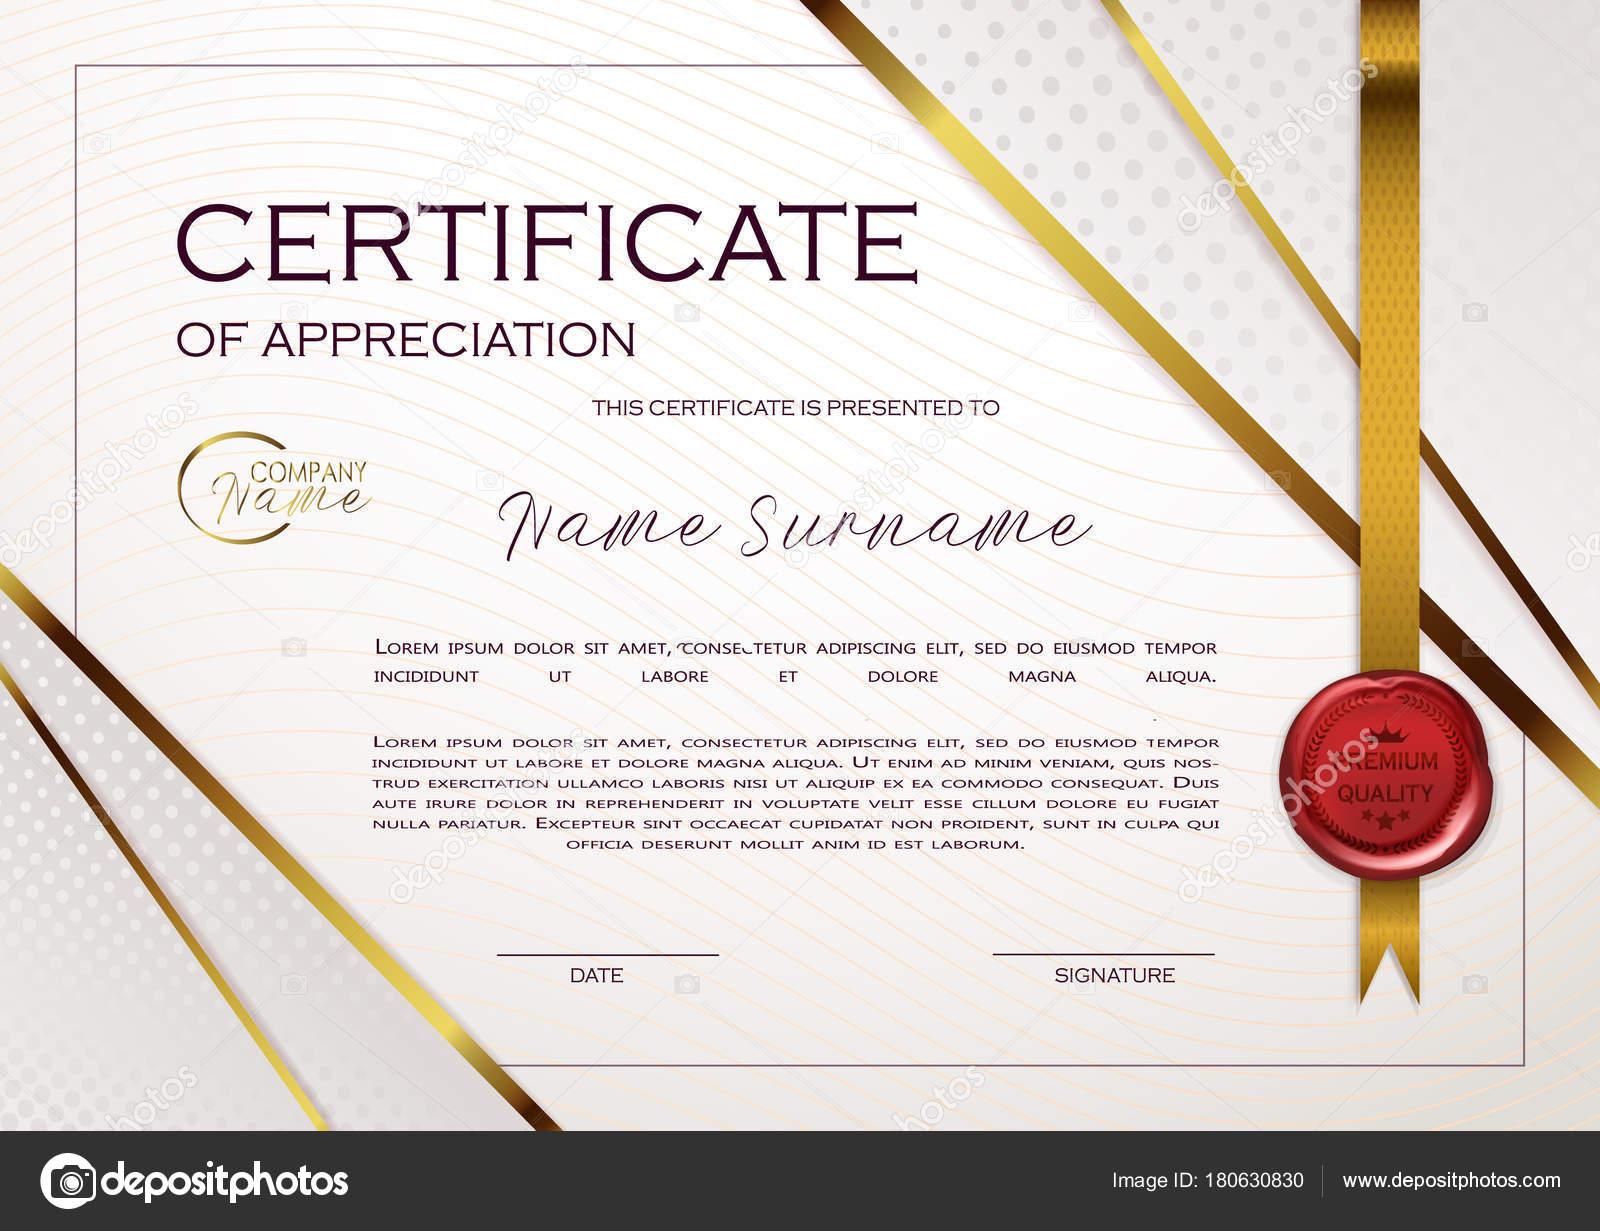 Qualification Certificate Appreciation Design Elegant Luxury Modern